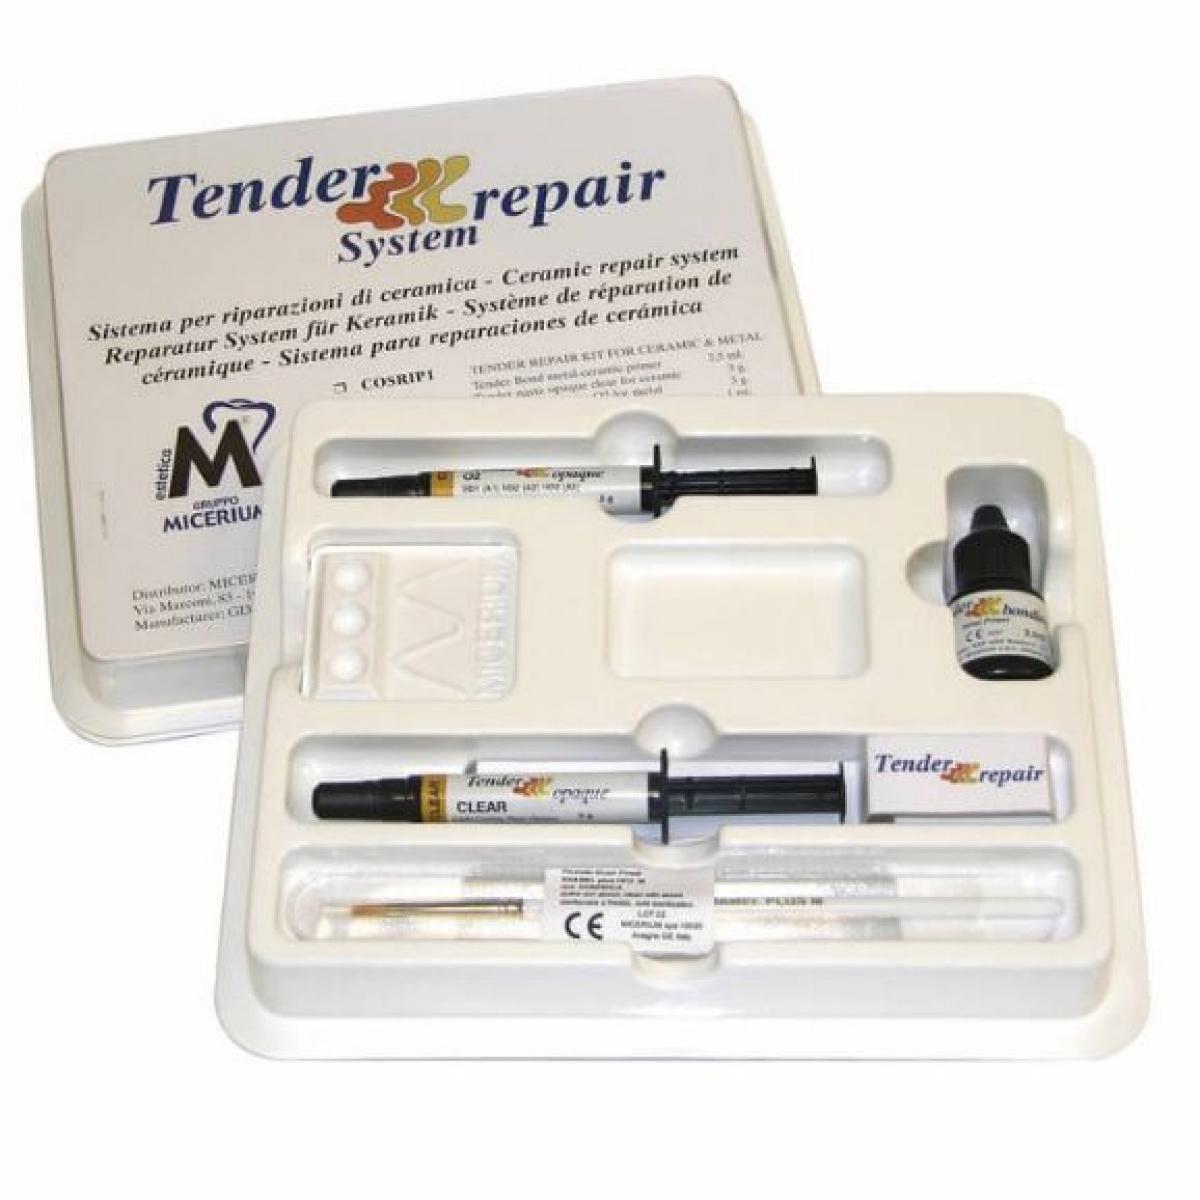 TENDER REPAIR KIT COMPLETO -